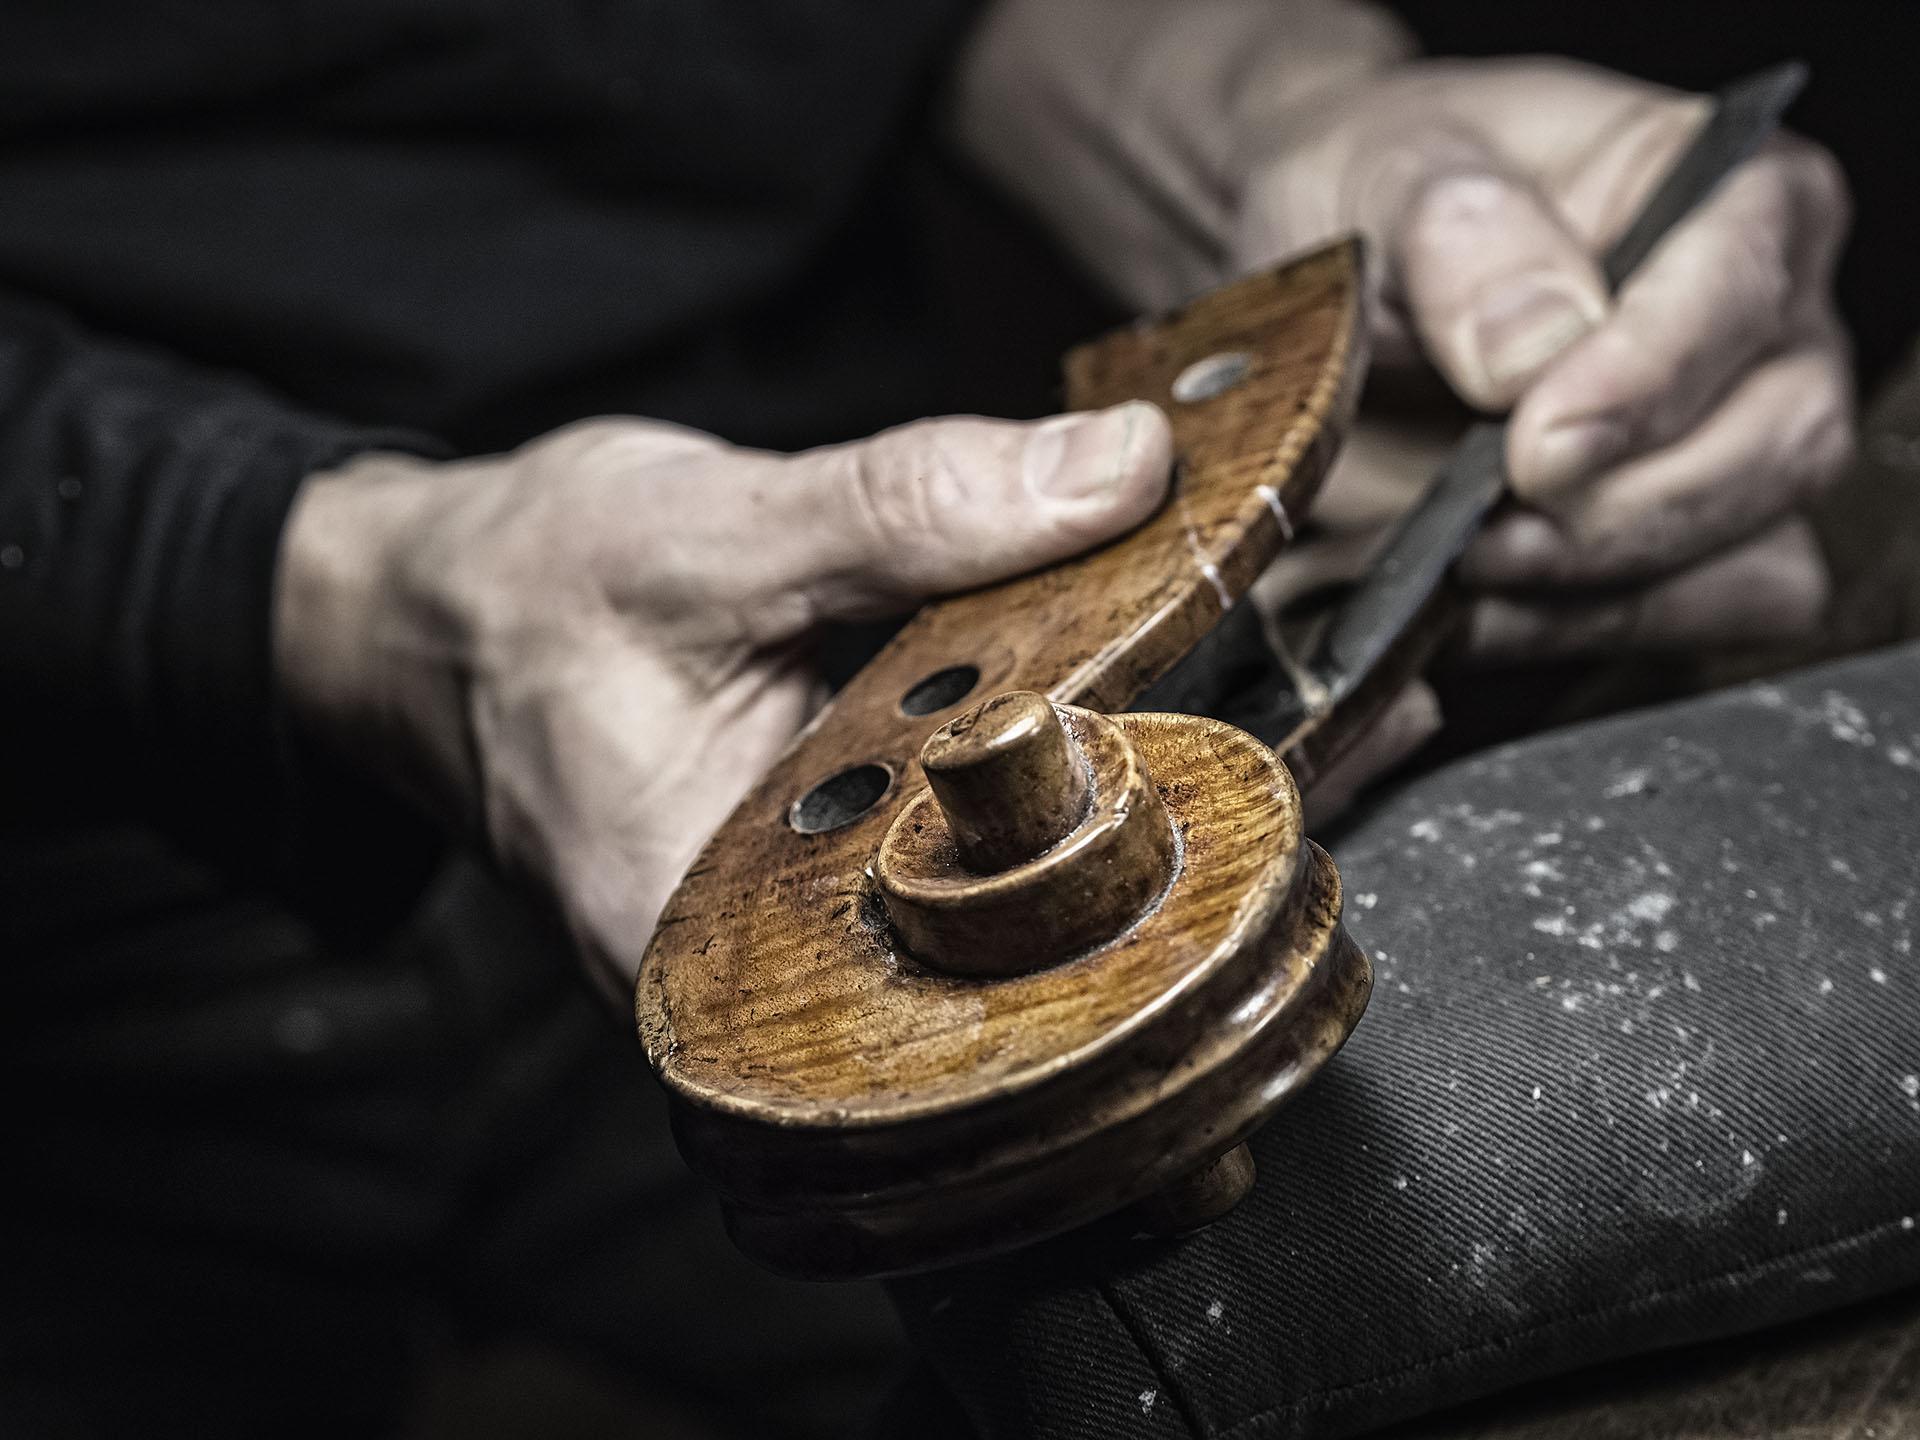 Violinbauer